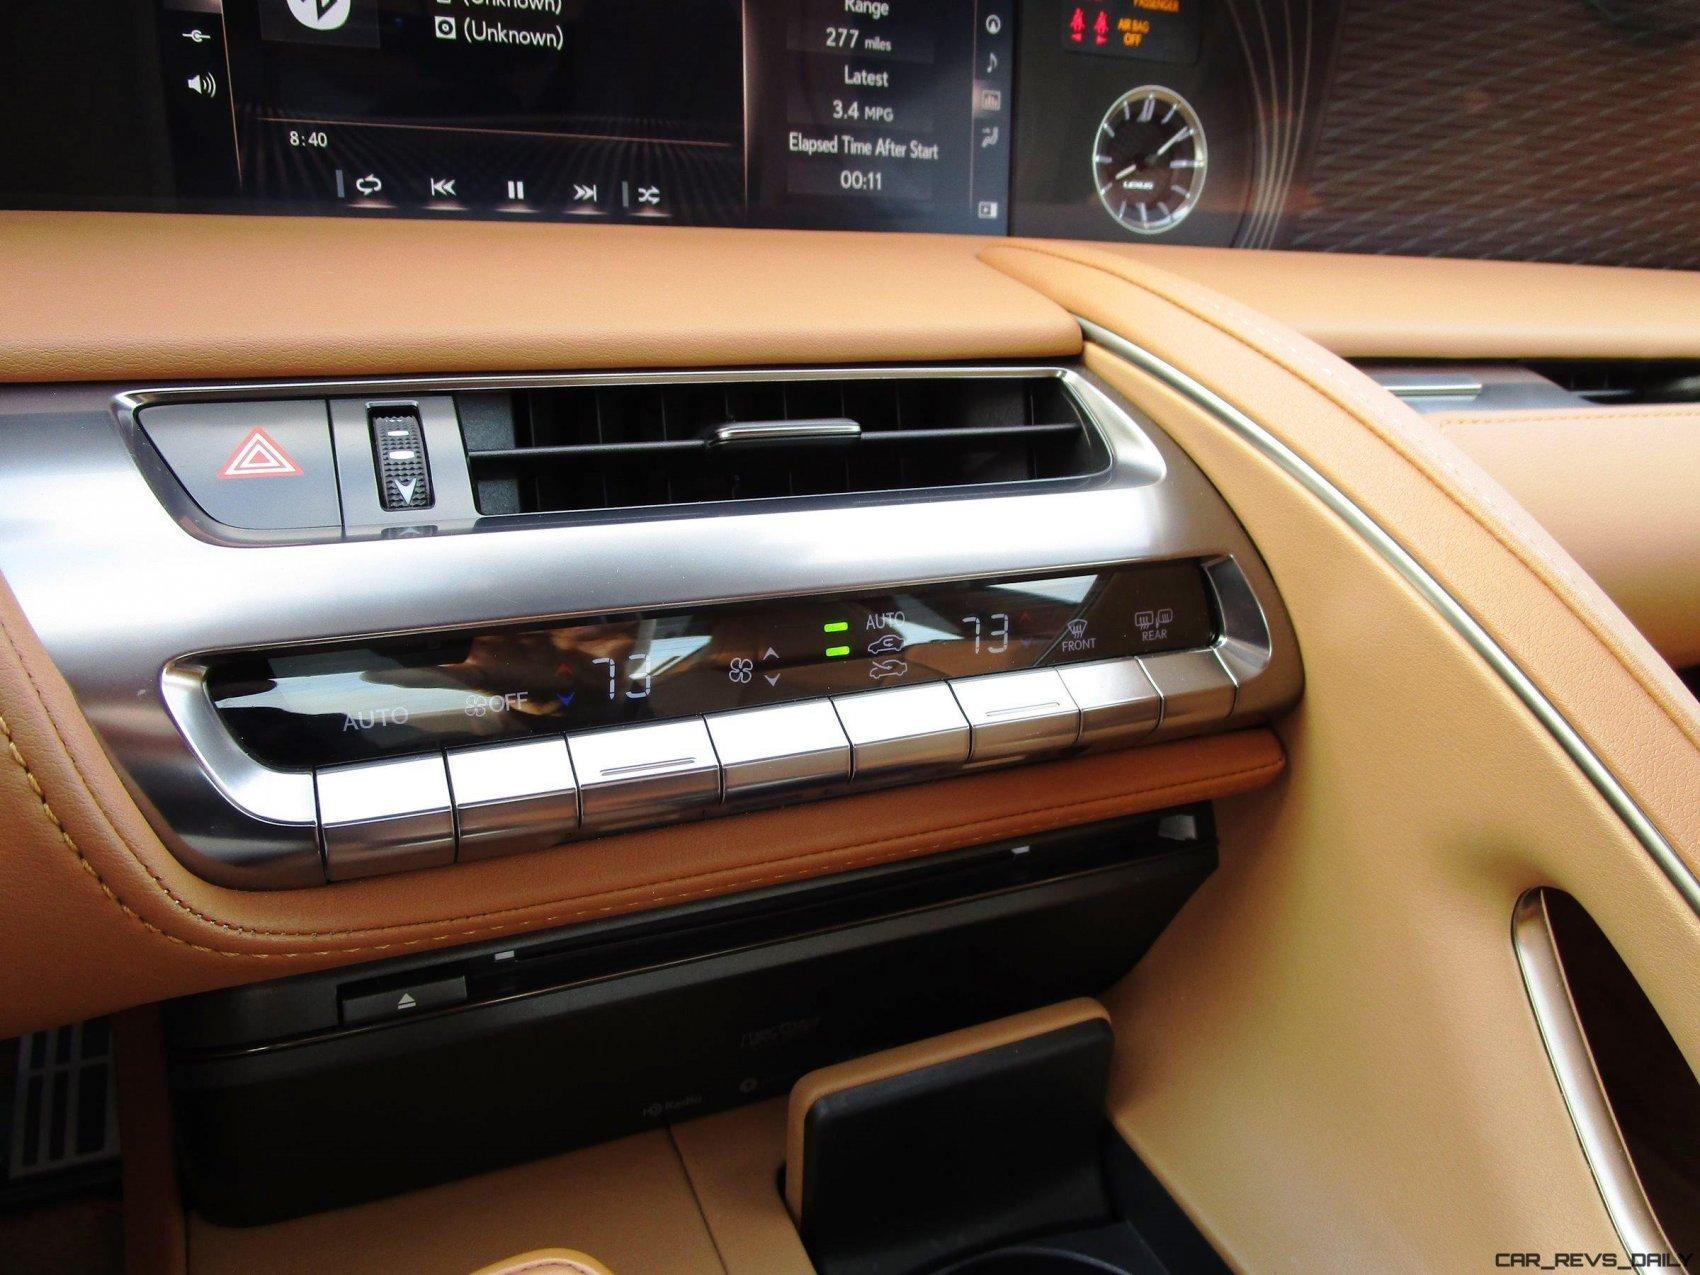 http://www.car-revs-daily.com/wp-content/uploads/2017/10/2018-Lexus-LC500-6.jpg